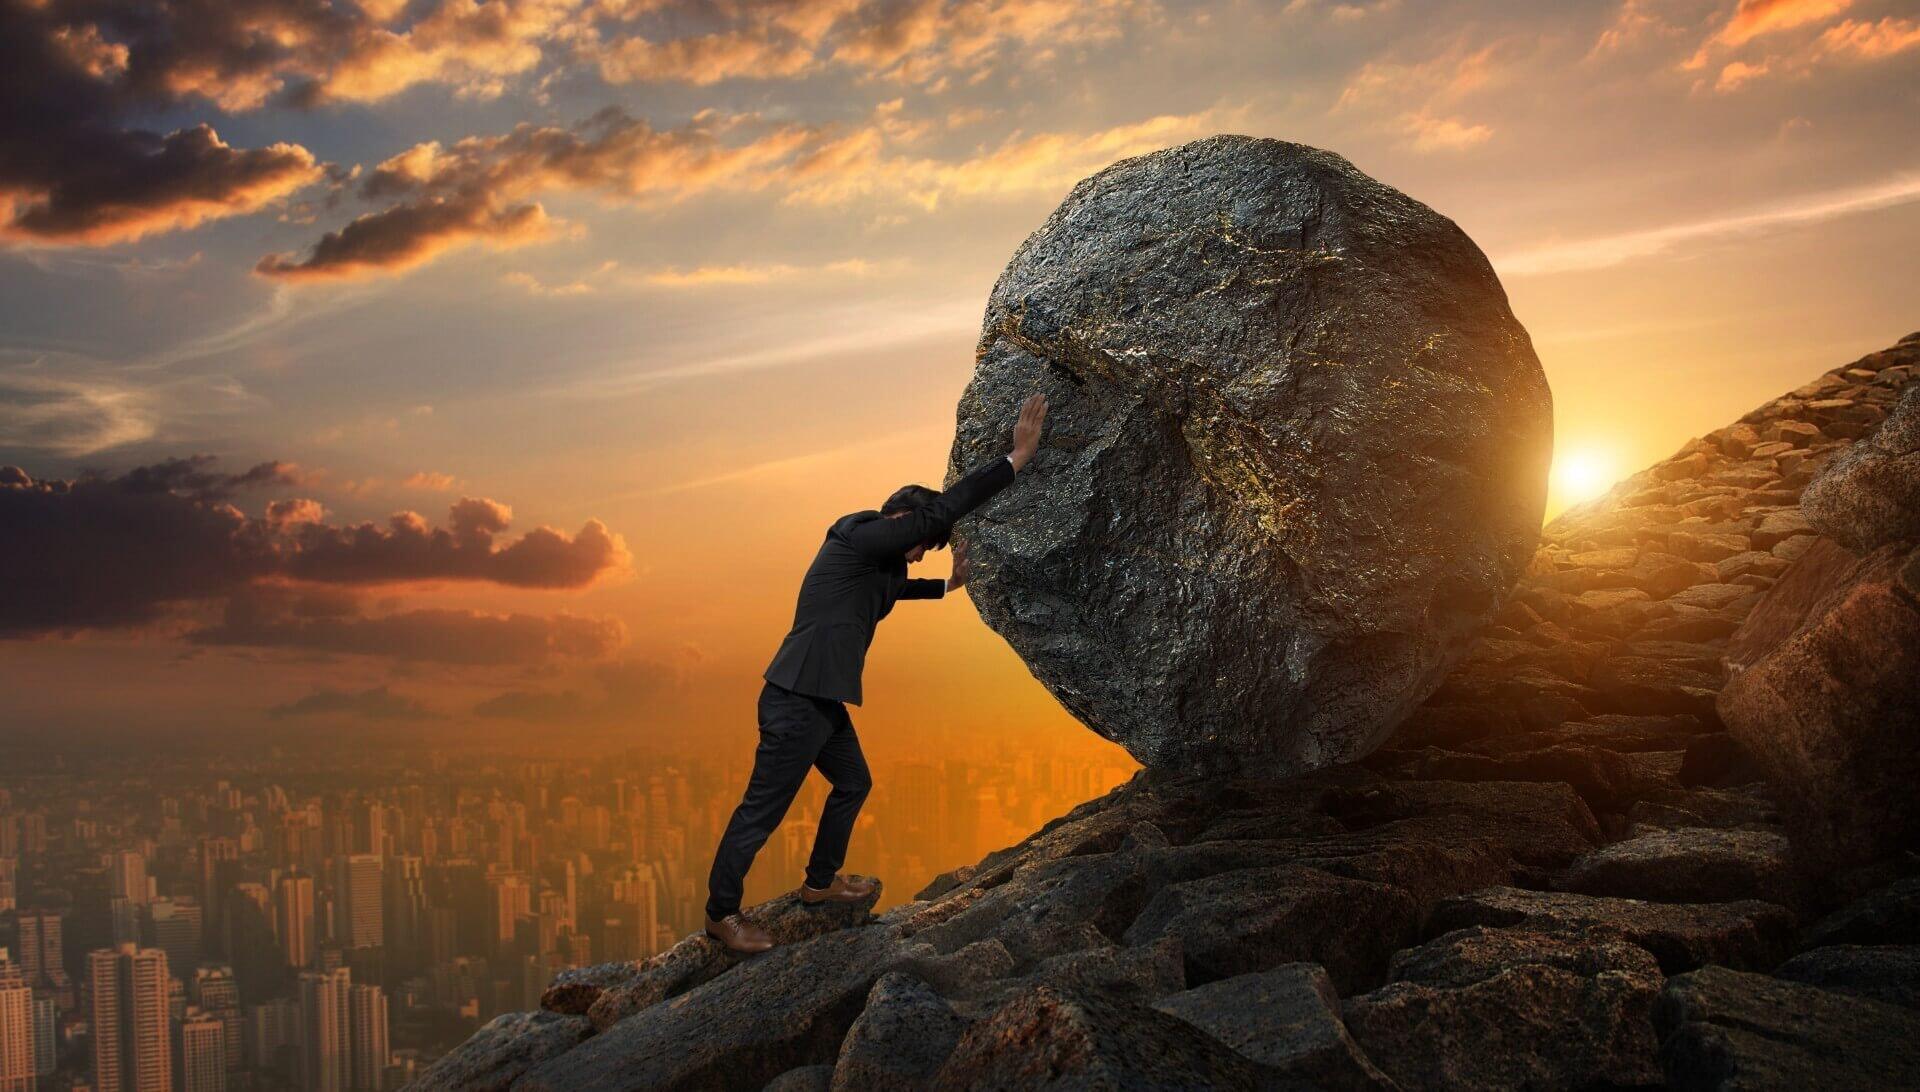 man holding a big rock